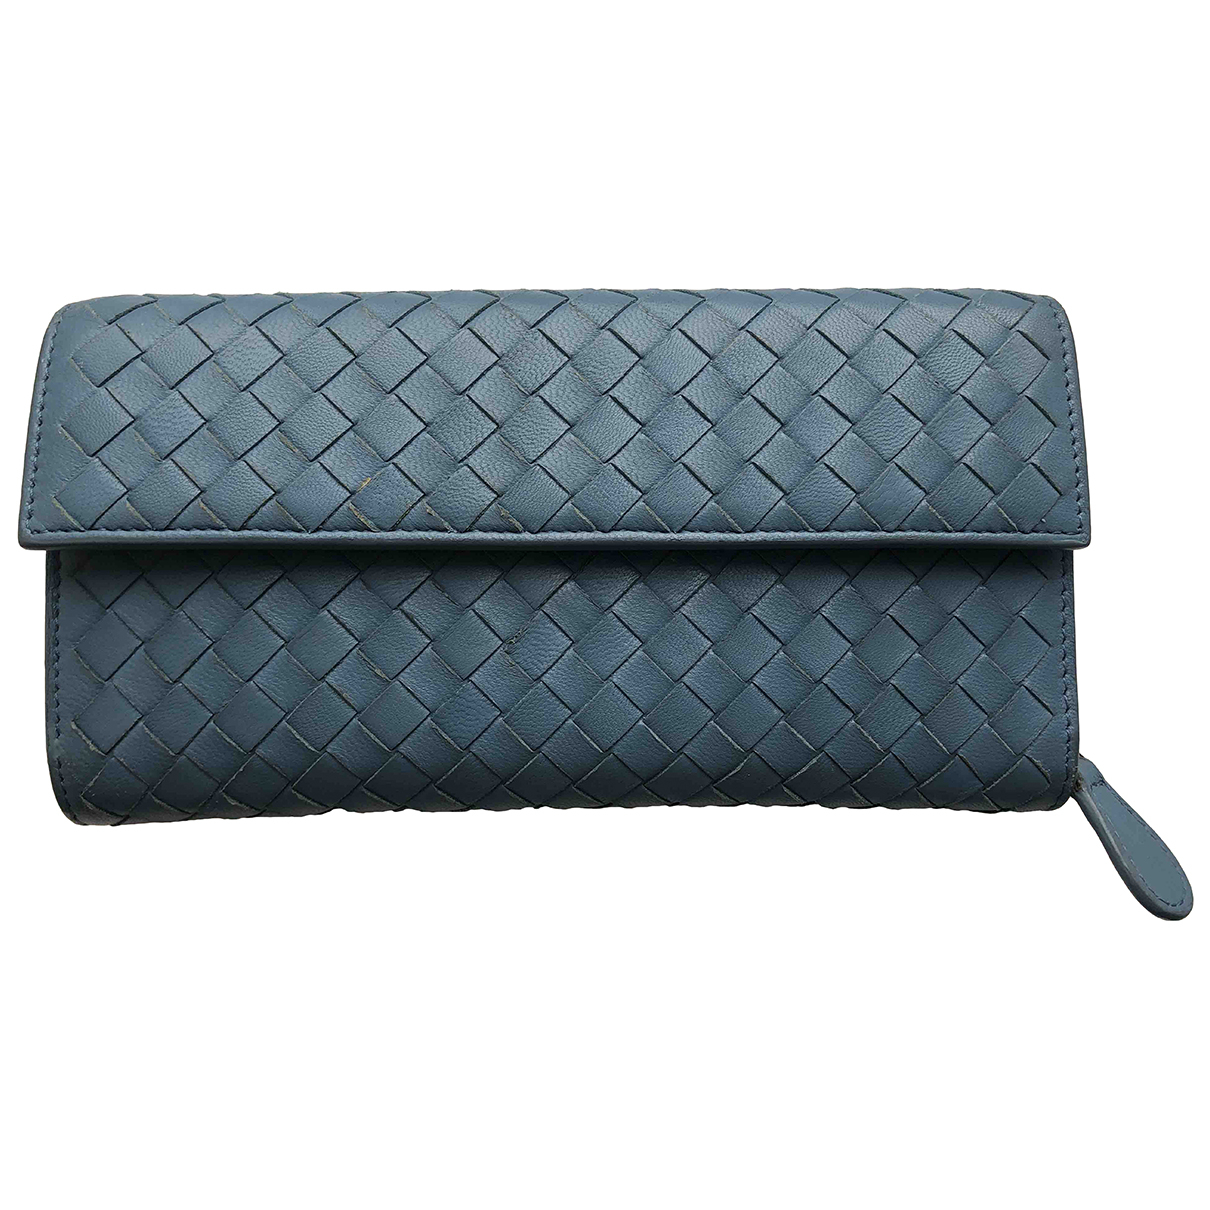 Bottega Veneta - Petite maroquinerie   pour femme en cuir - bleu